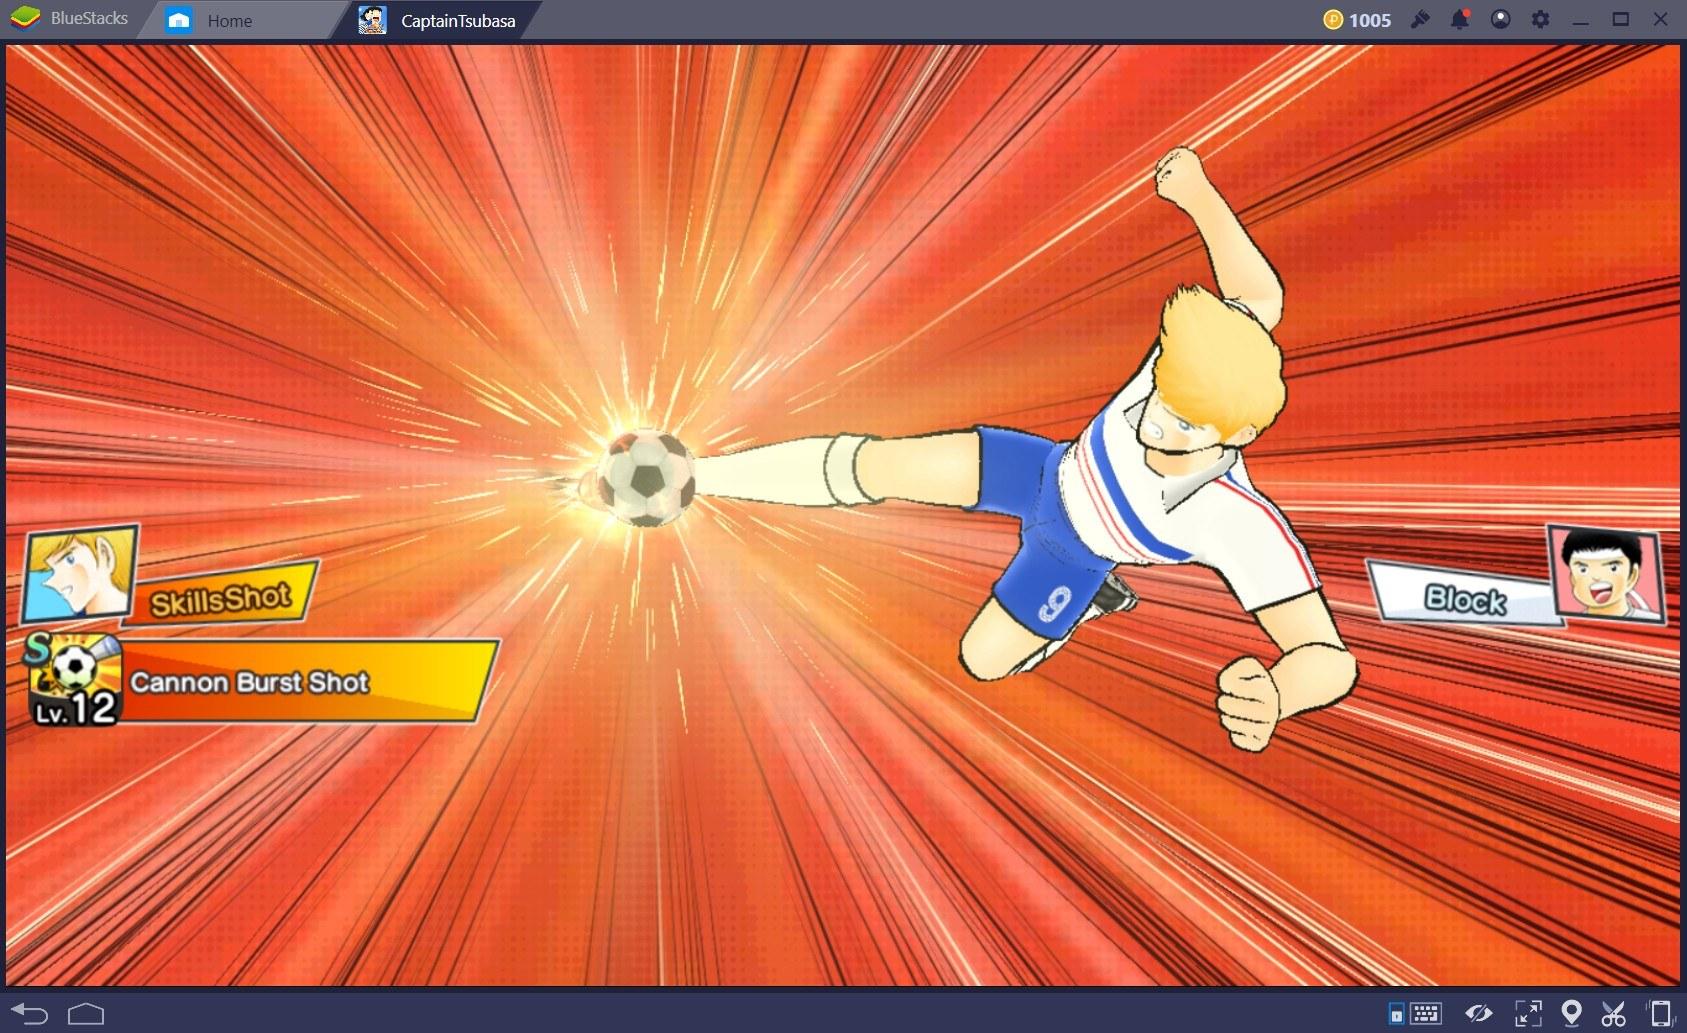 Captain Tsubasa: Dream Team – Game hay mùa World Cup 2018 để chơi cùng BlueStacks